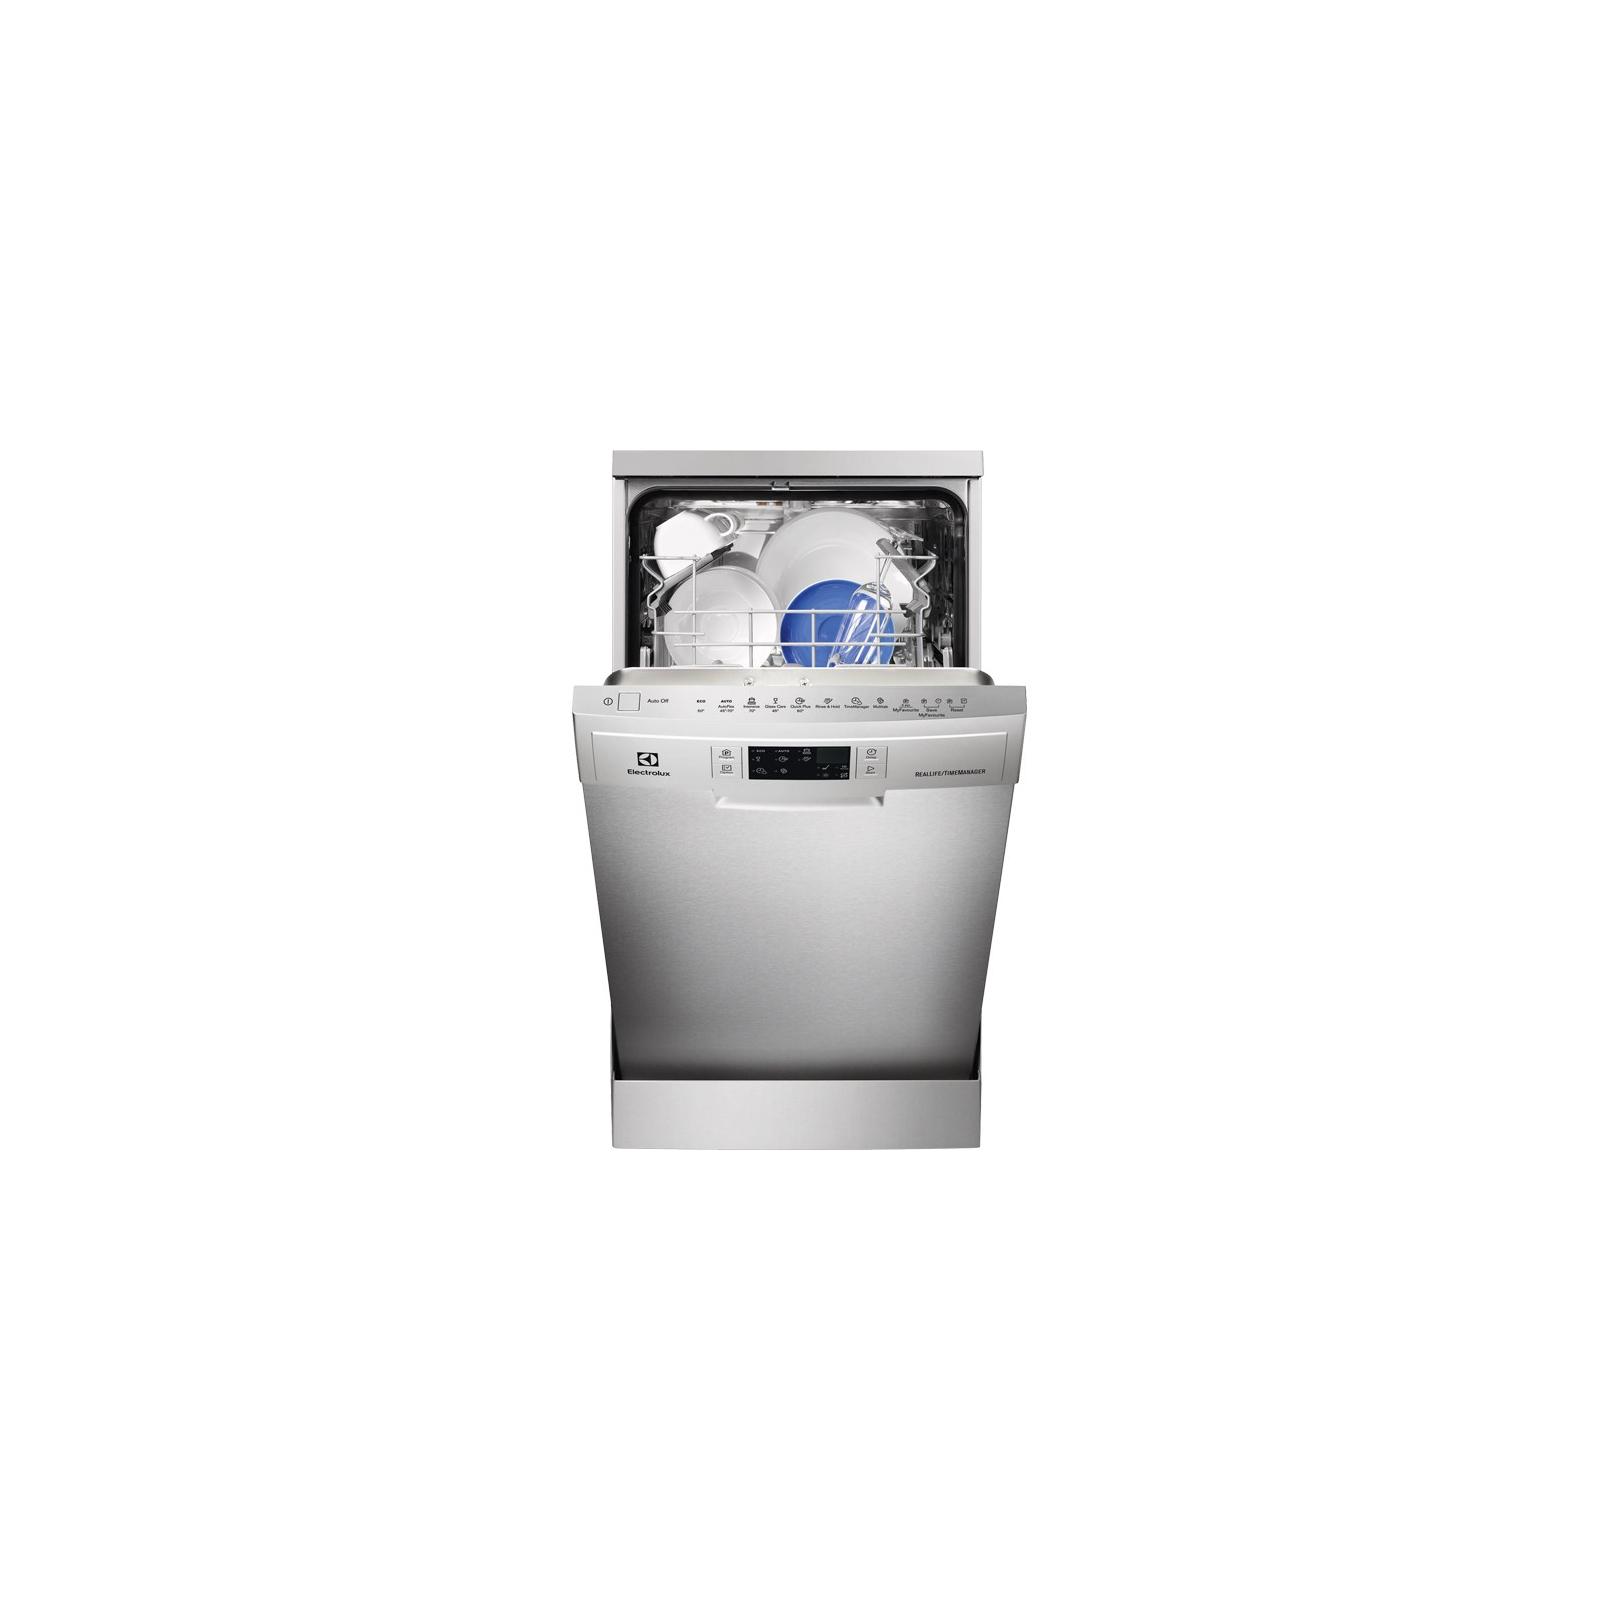 Посудомоечная машина ELECTROLUX ESF 4660 ROX (ESF4660ROX)